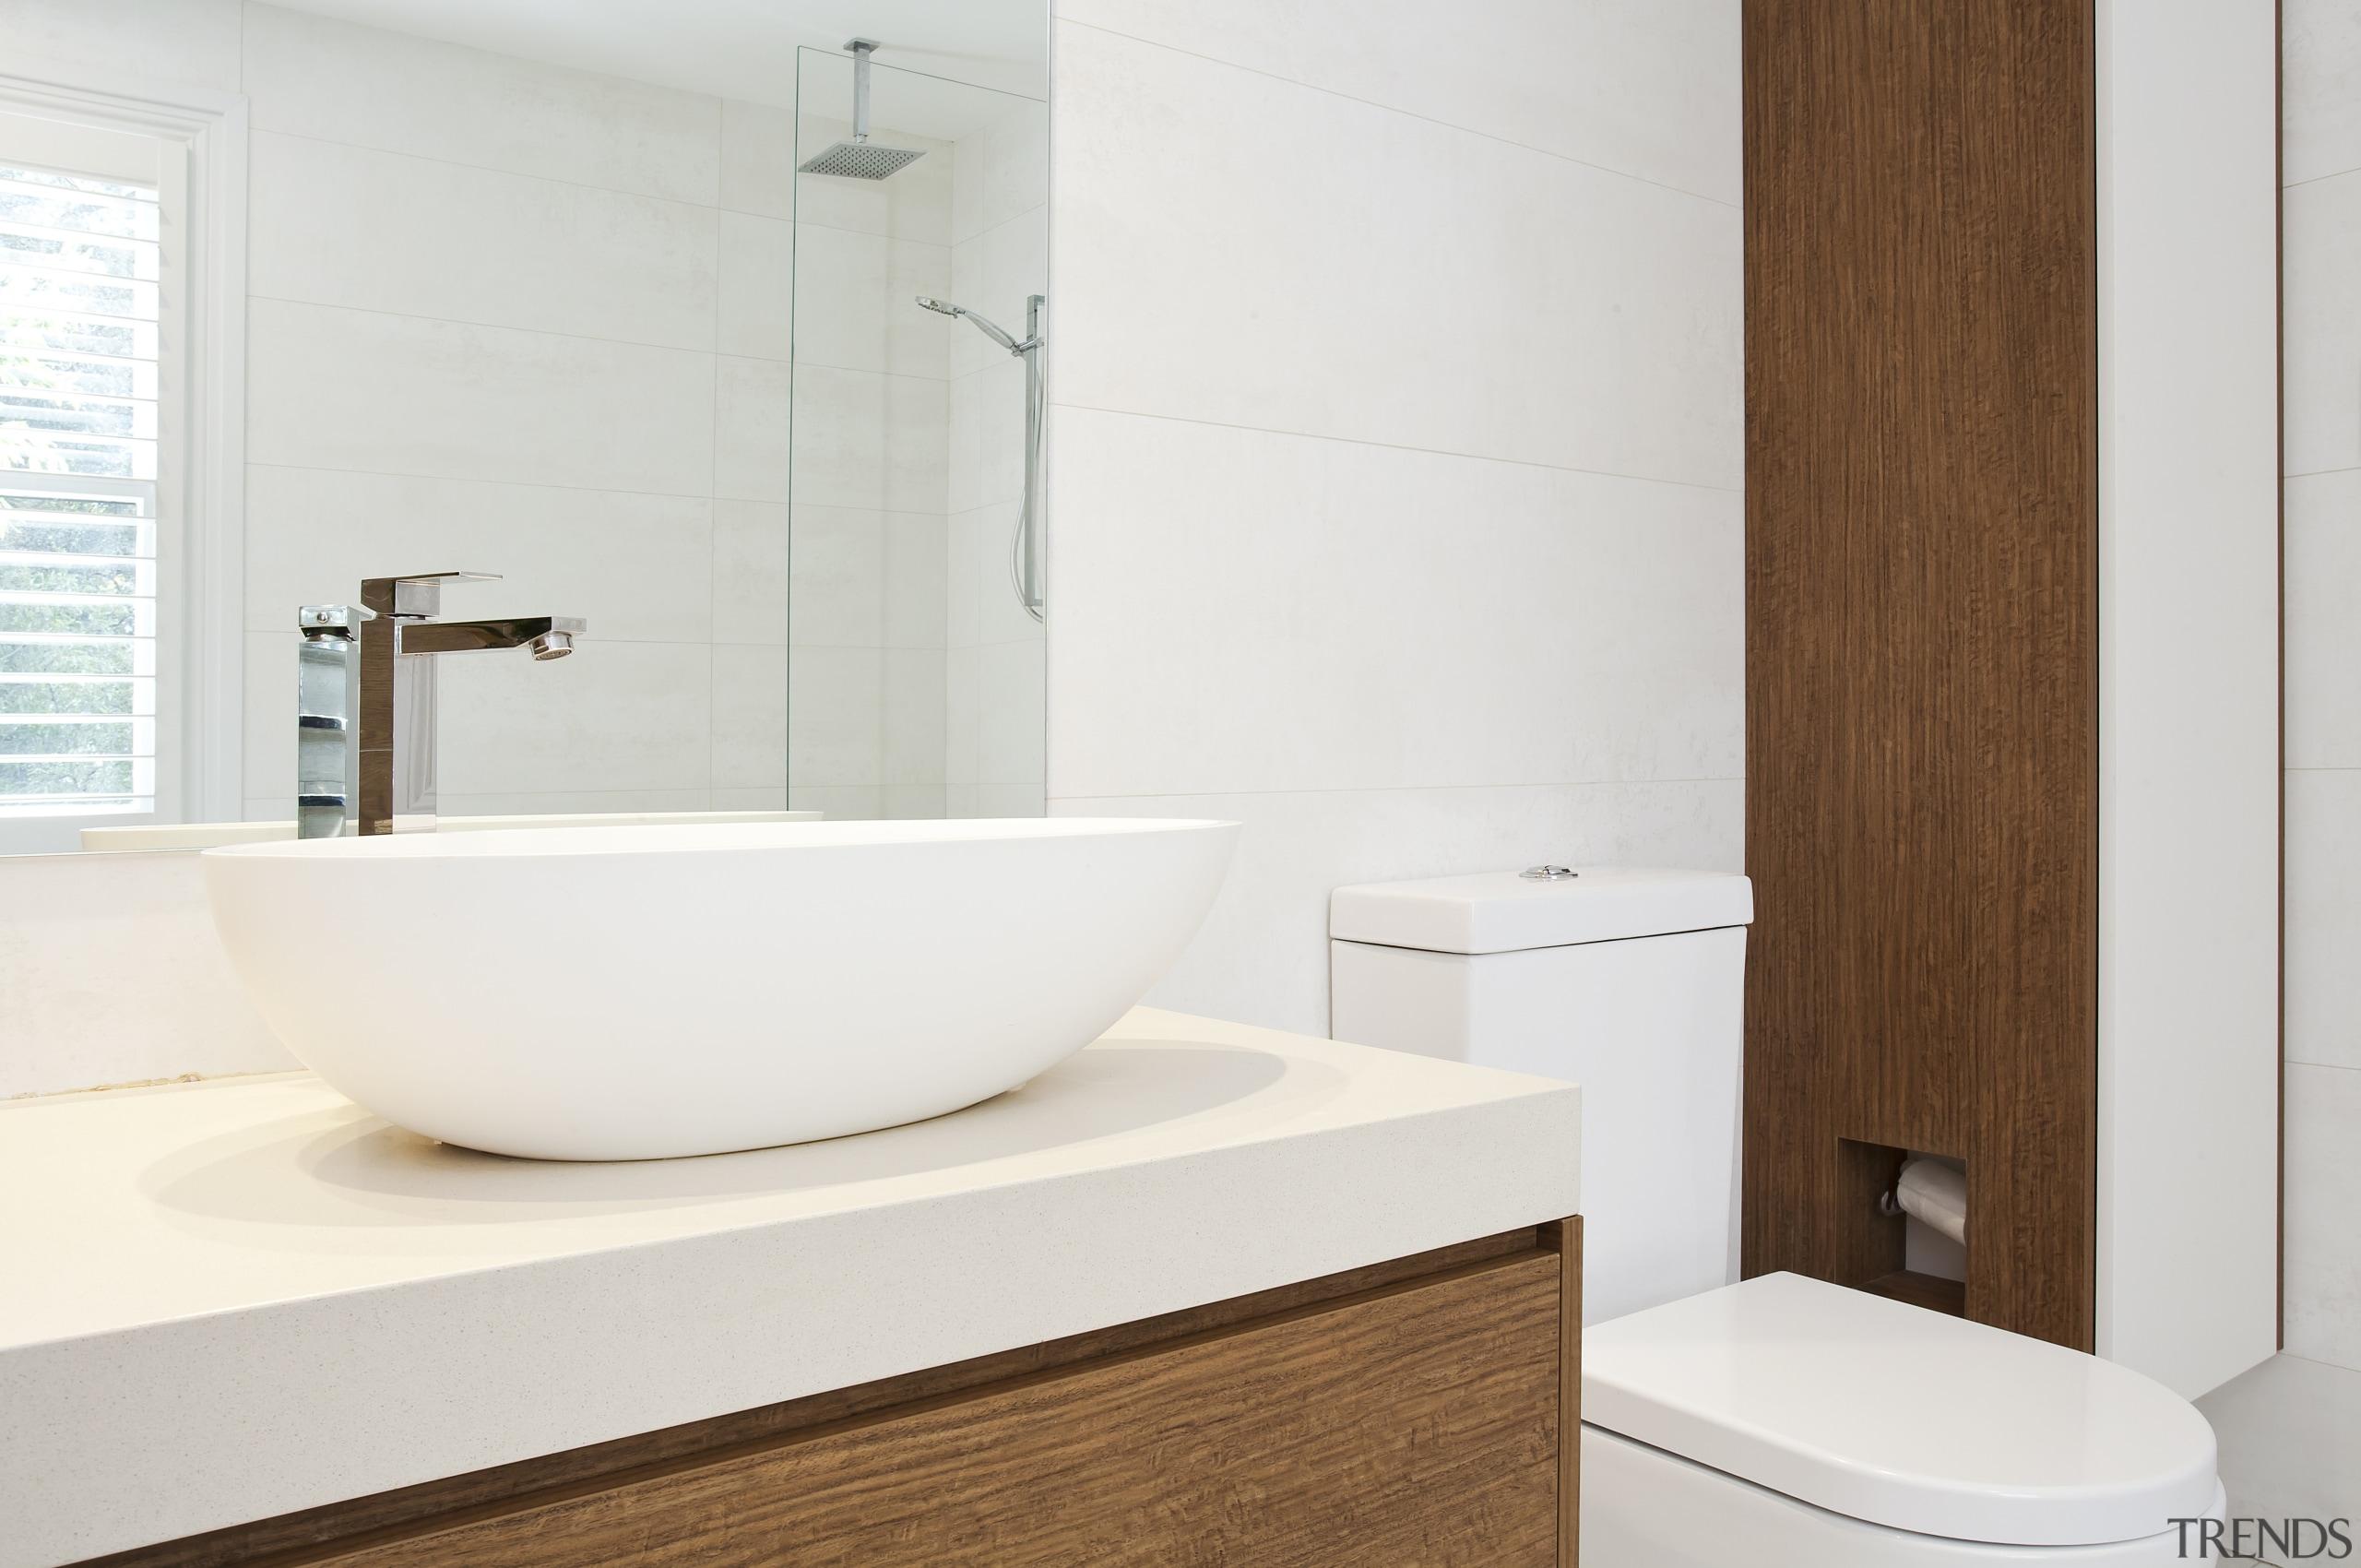 In this bathroom by designer Anna Klimova, recessed bathroom, bathroom accessory, bathroom cabinet, bathroom sink, bidet, ceramic, floor, interior design, plumbing fixture, product design, room, sink, tap, toilet seat, white